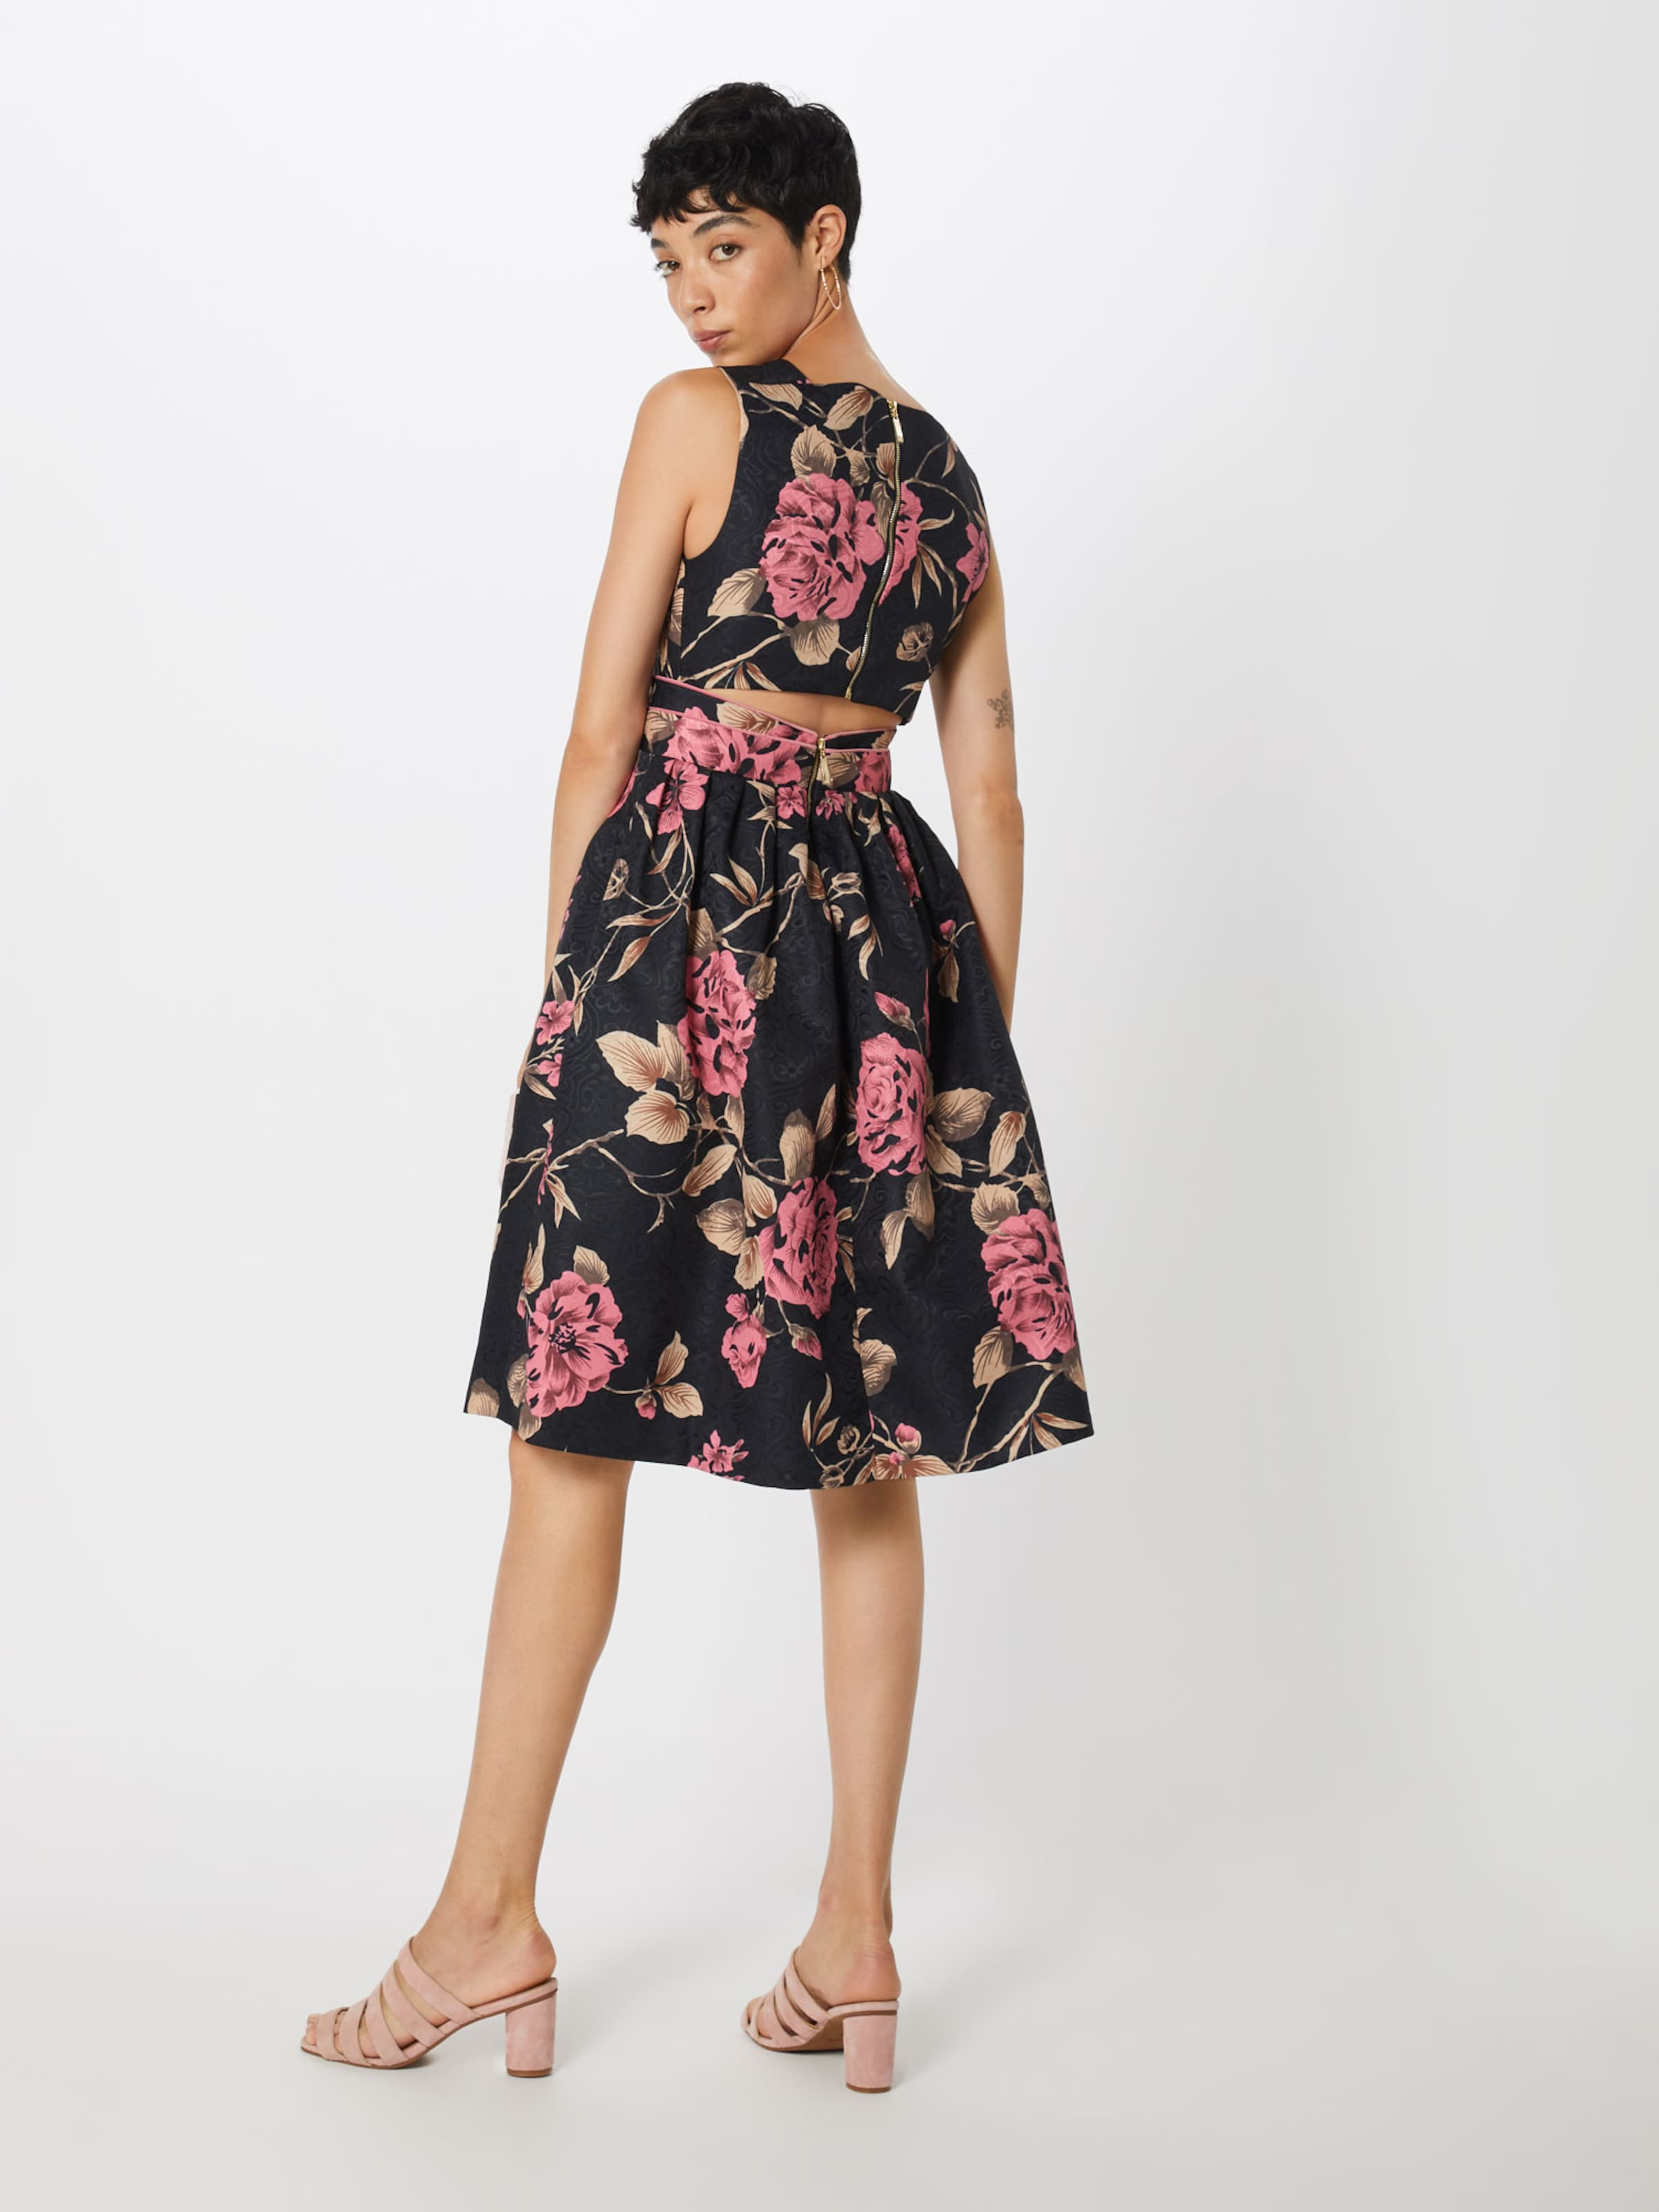 'midikleid Print' Four Kleid NachtblauPink In Flavor 0nO8XPkw